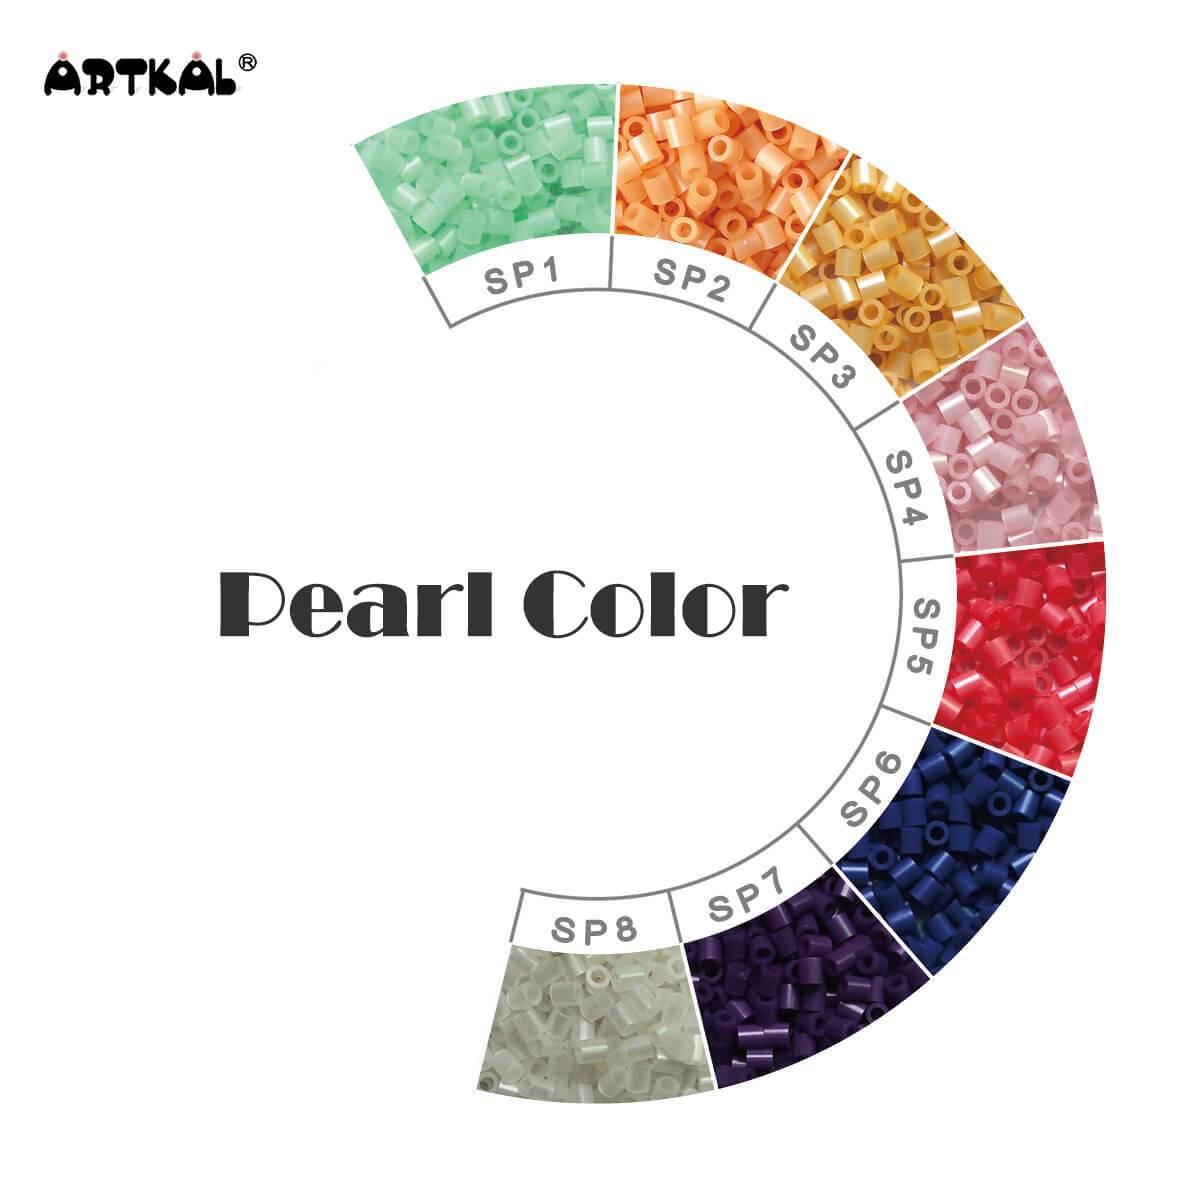 21-artkal-beads-s-5mm-sp-2000x.jpg